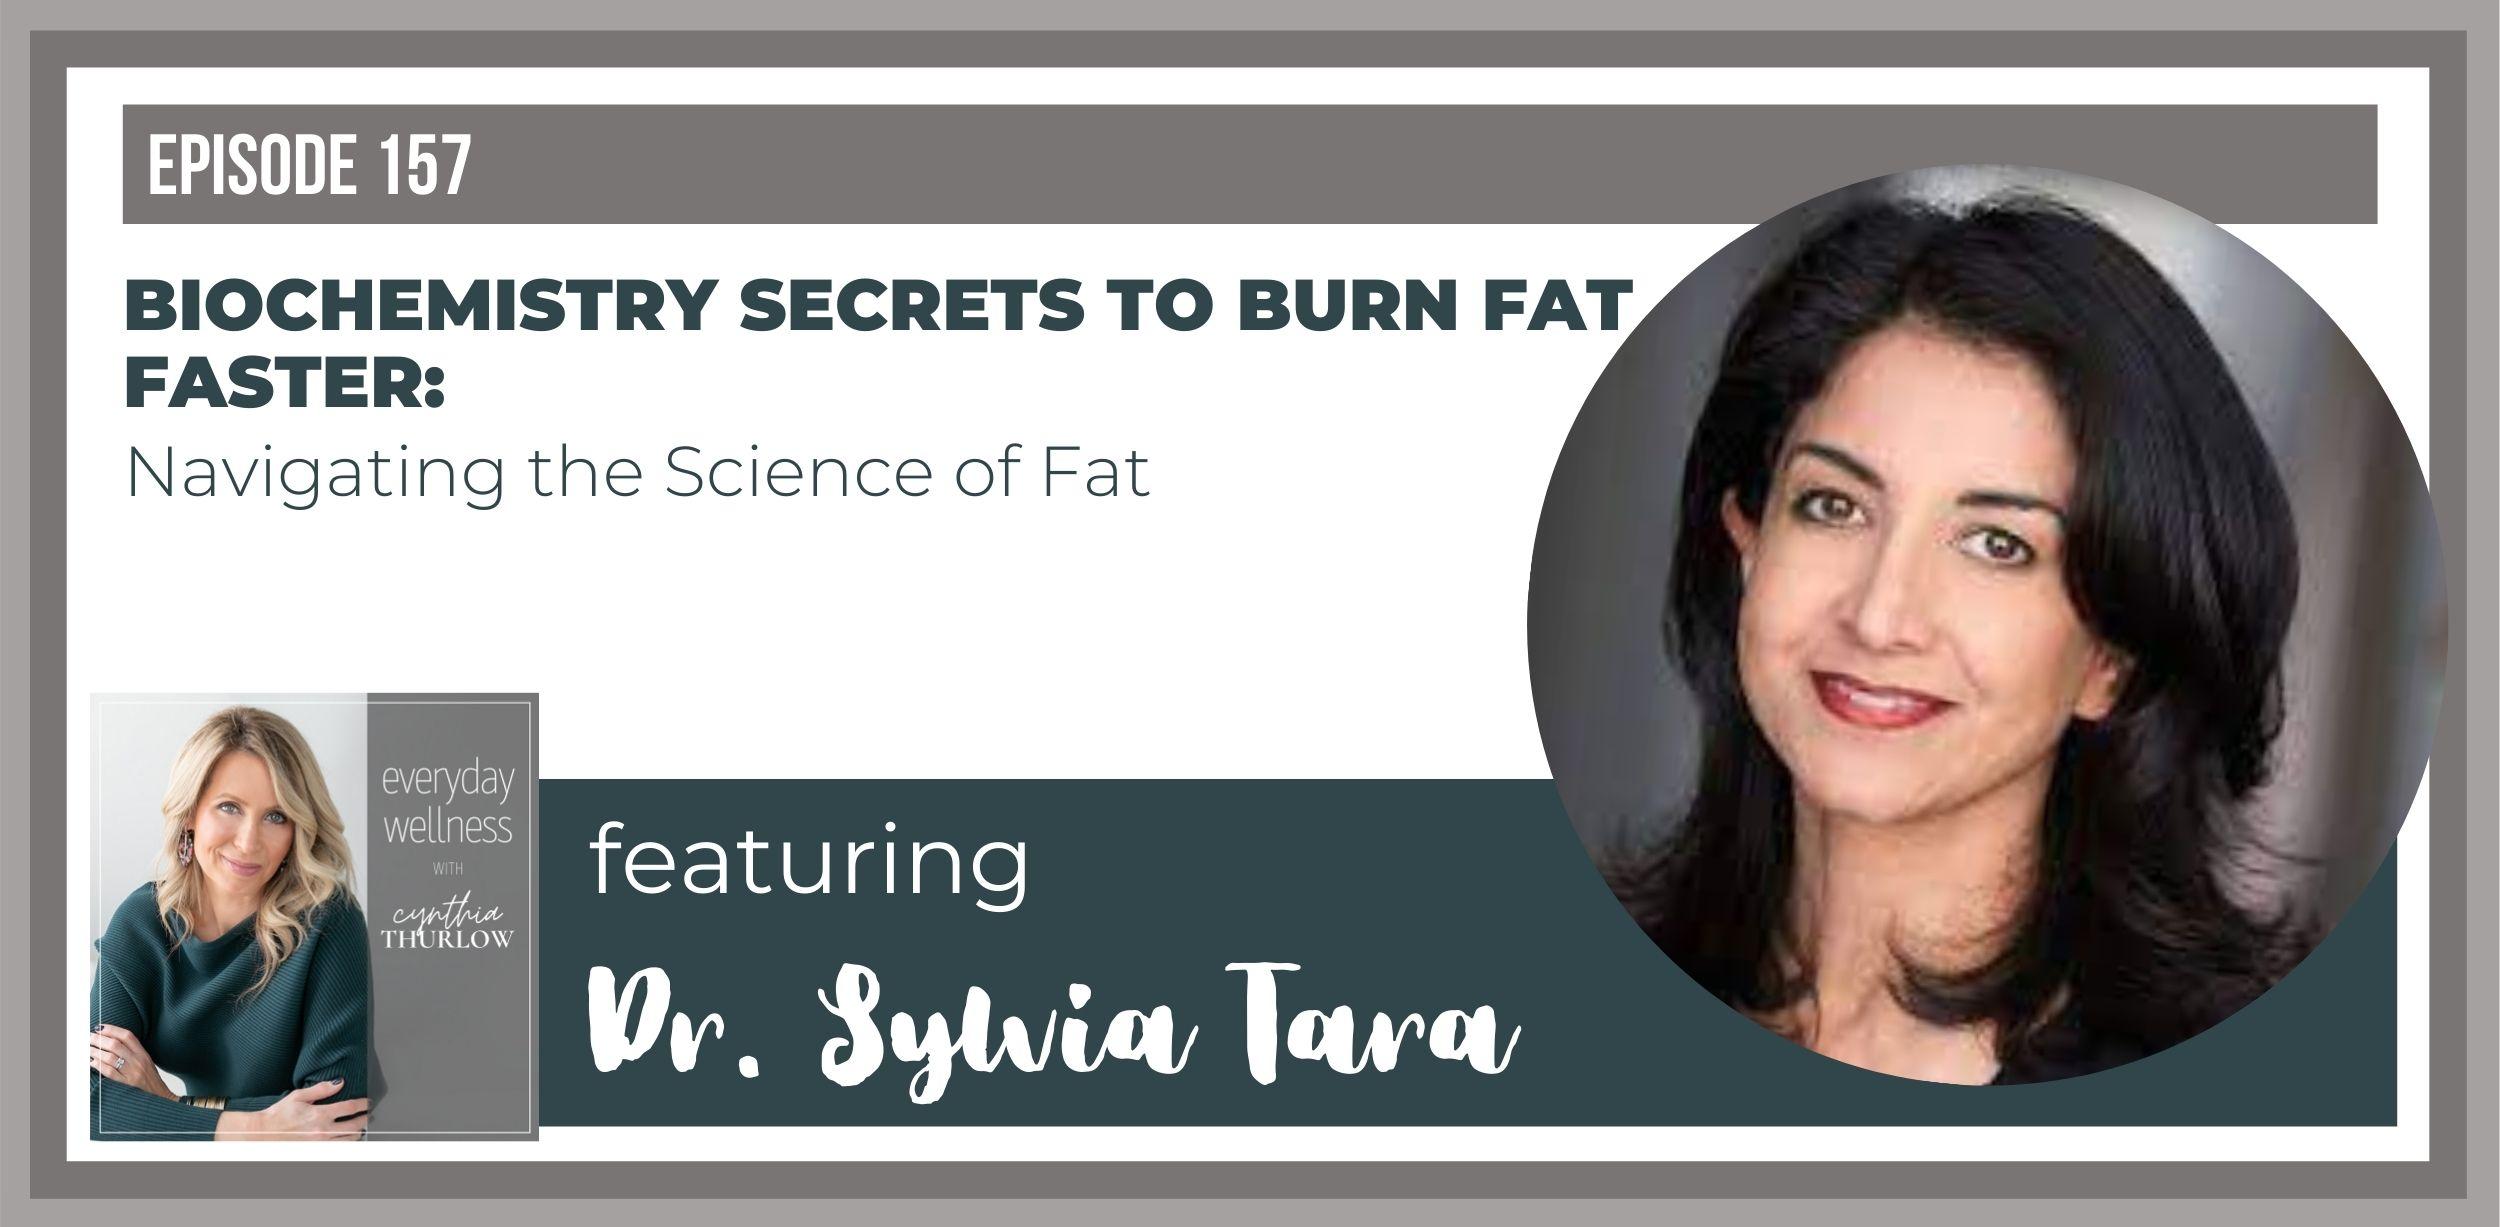 Dr. Sylvia Tara on Everyday Wellness Podcast with Cynthia Thurlow